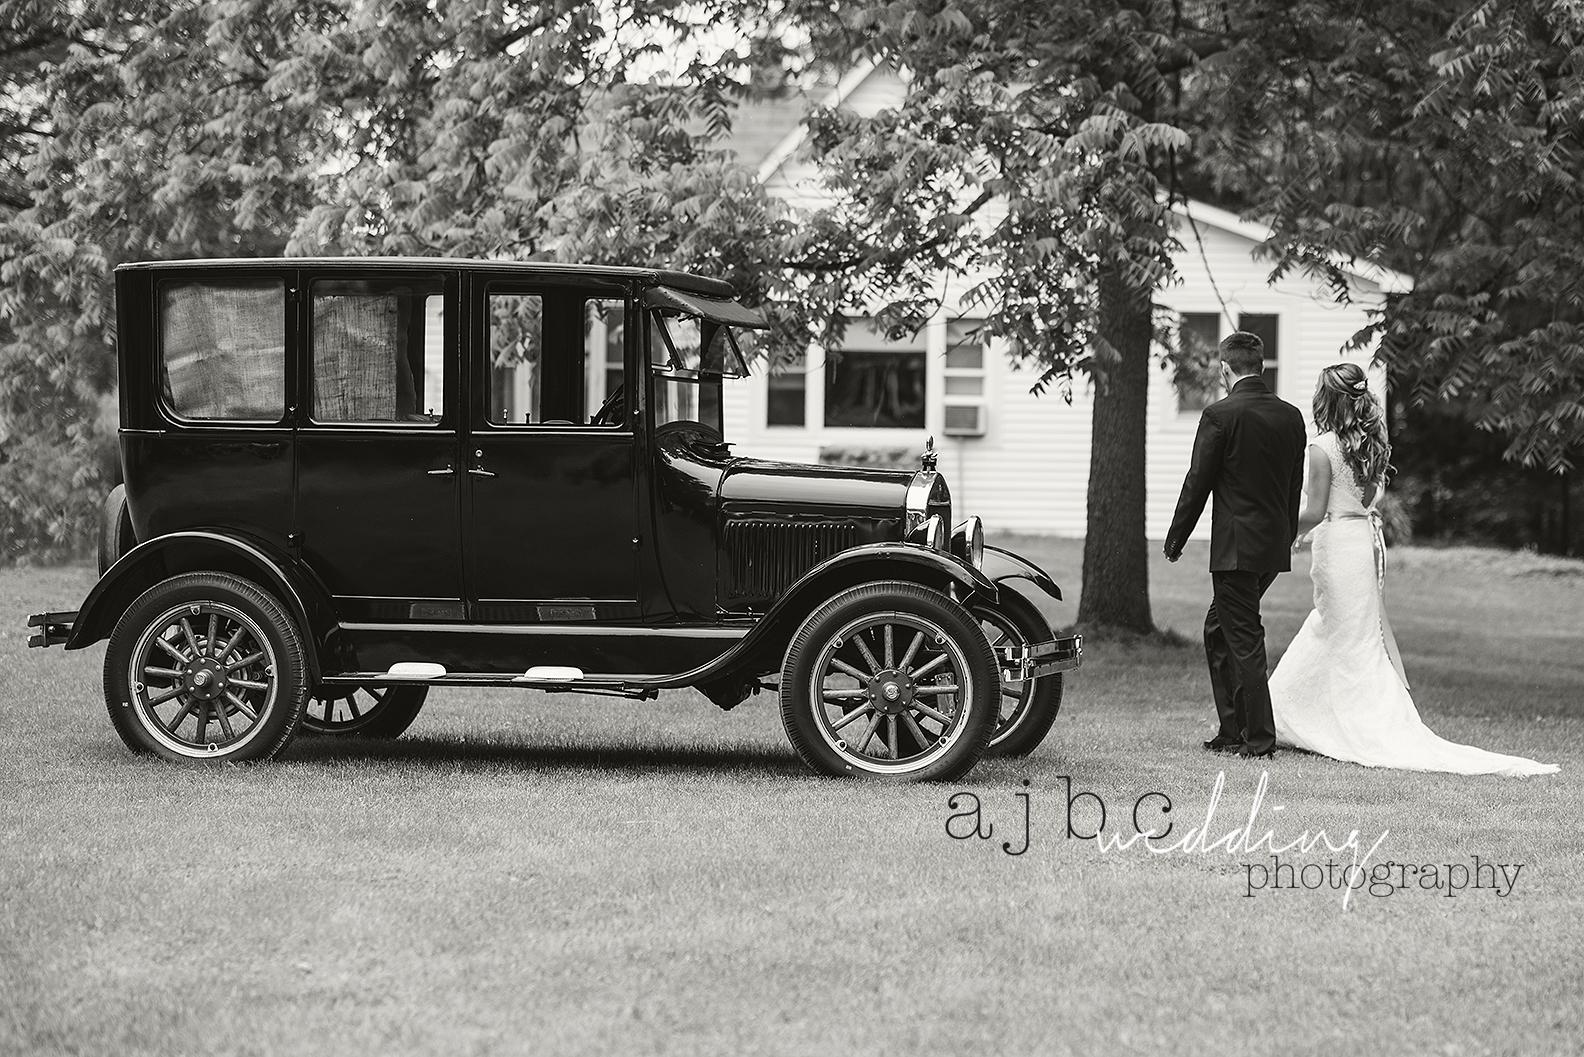 ajbcphotography-port-huron-michigan-wedding-photographer-outdoors-summer-wedding-country-wedding-wadhams-michigan-bride-groom-love-classic-car-vintage-wedding.jpg